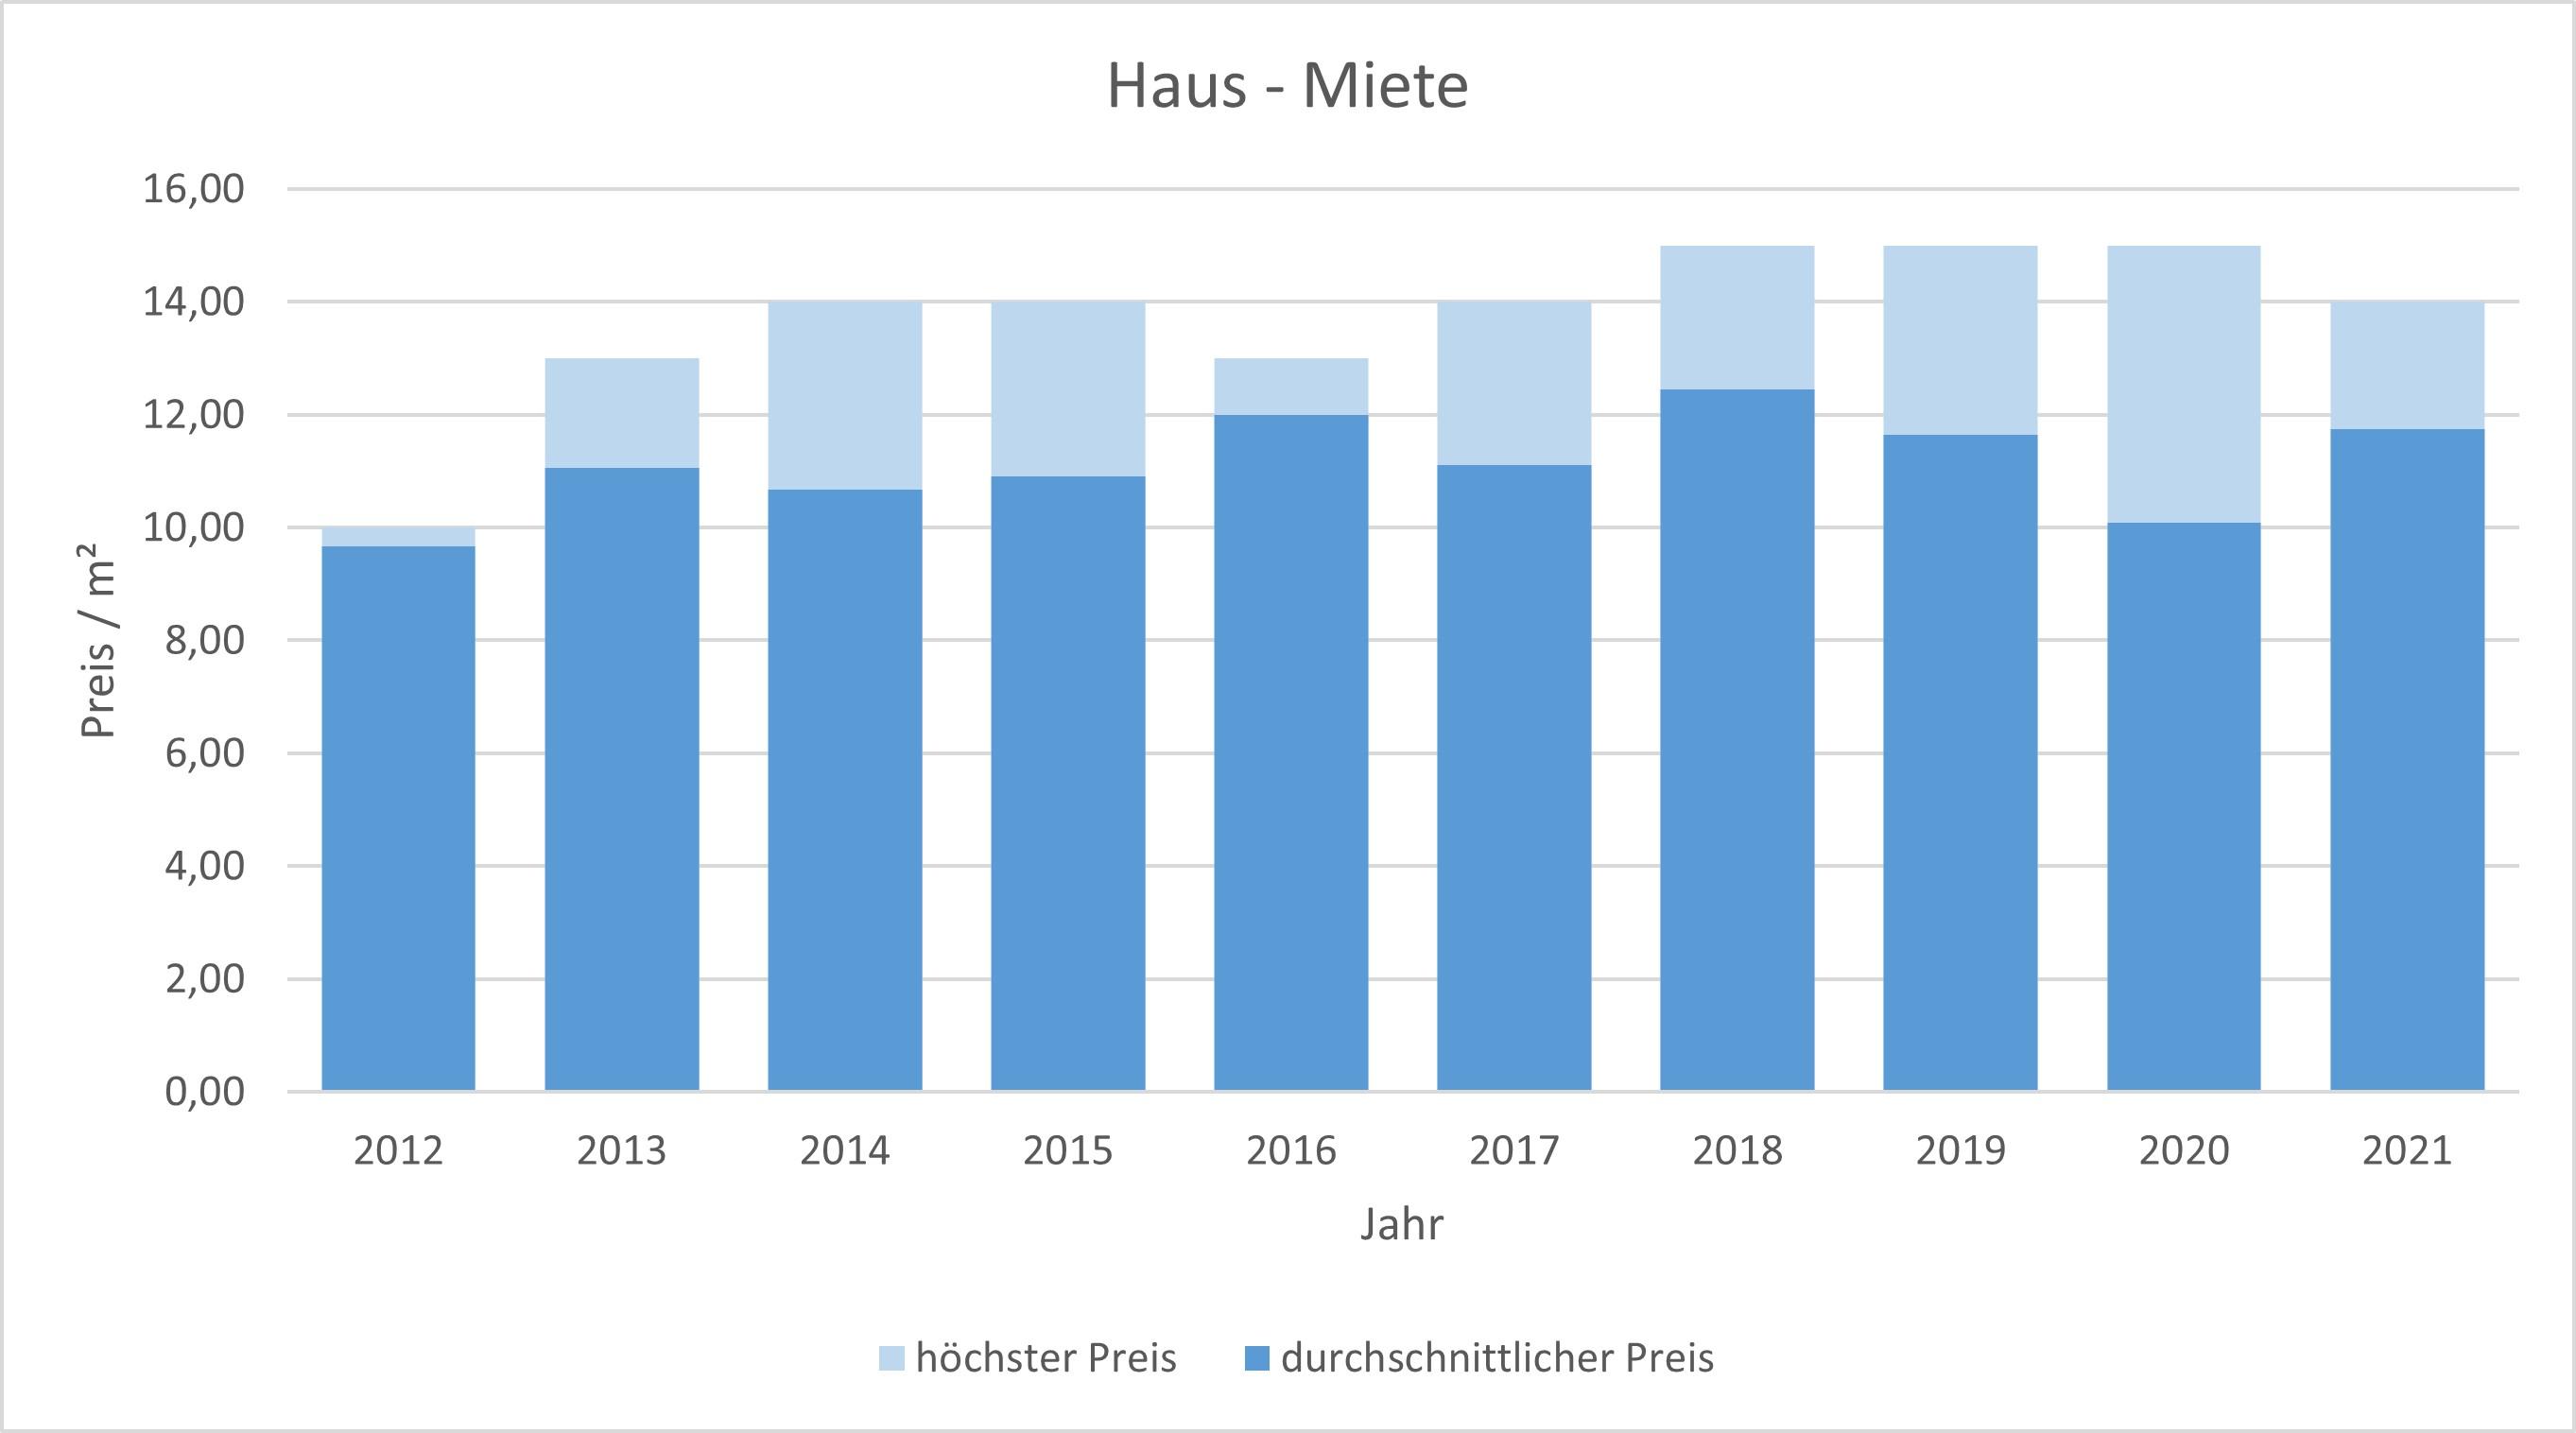 Otterfing Haus mieten vermieten Preis Bewertung Makler www.happy-immo.de 2019 2020 2021